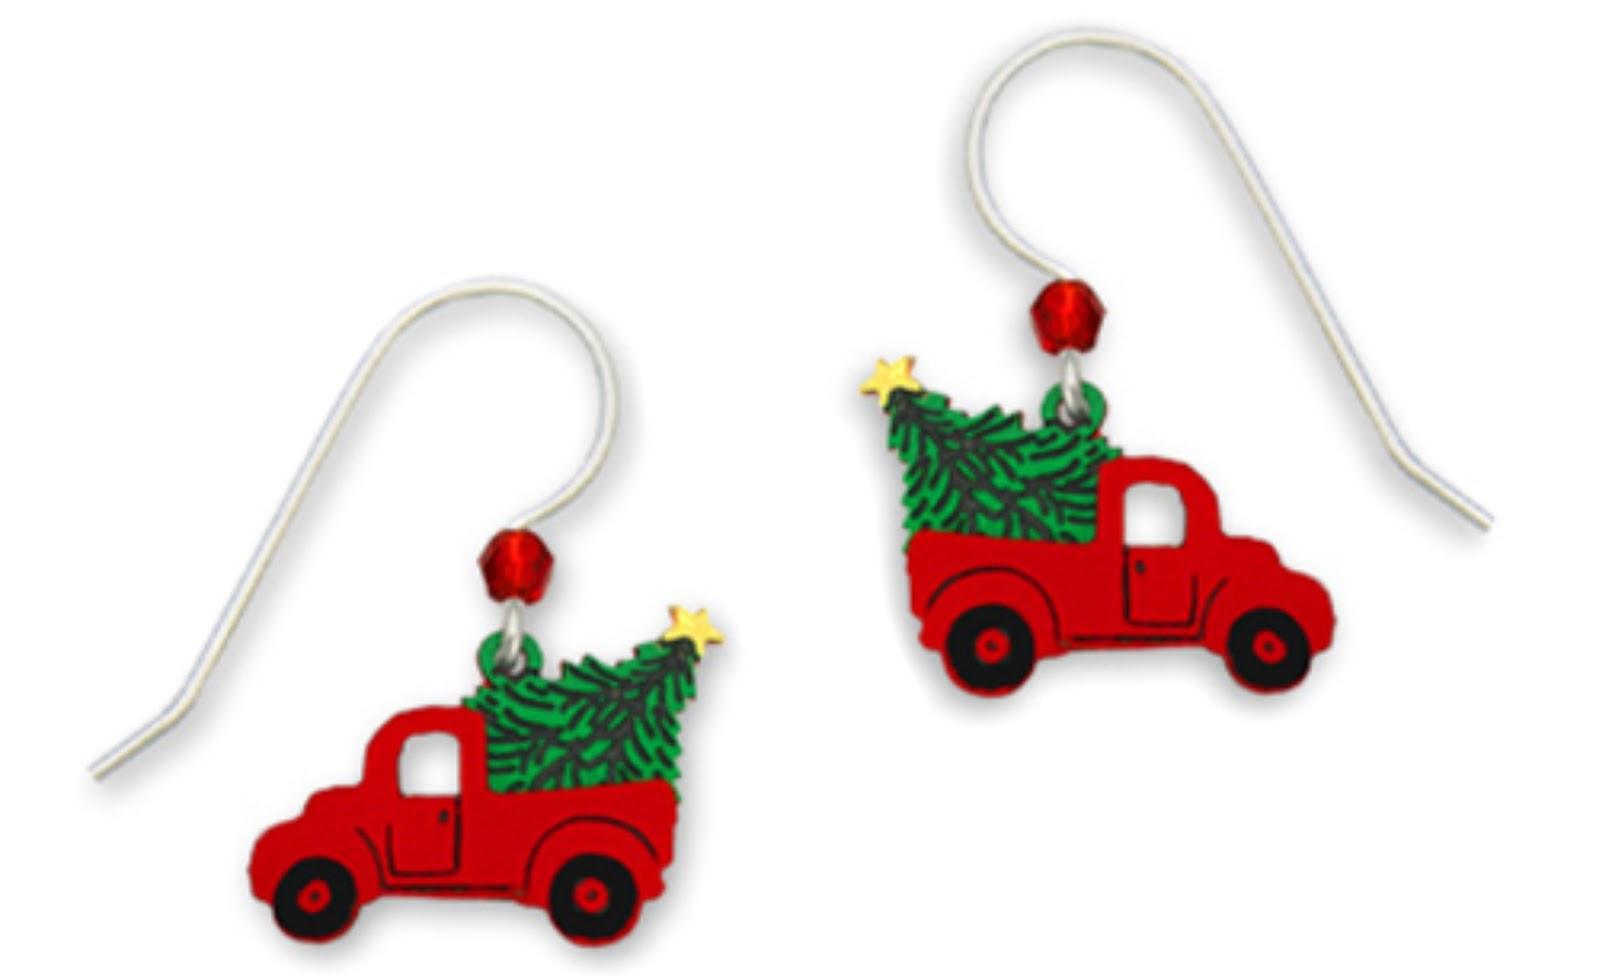 Merck Family Old World Christmas Ornaments